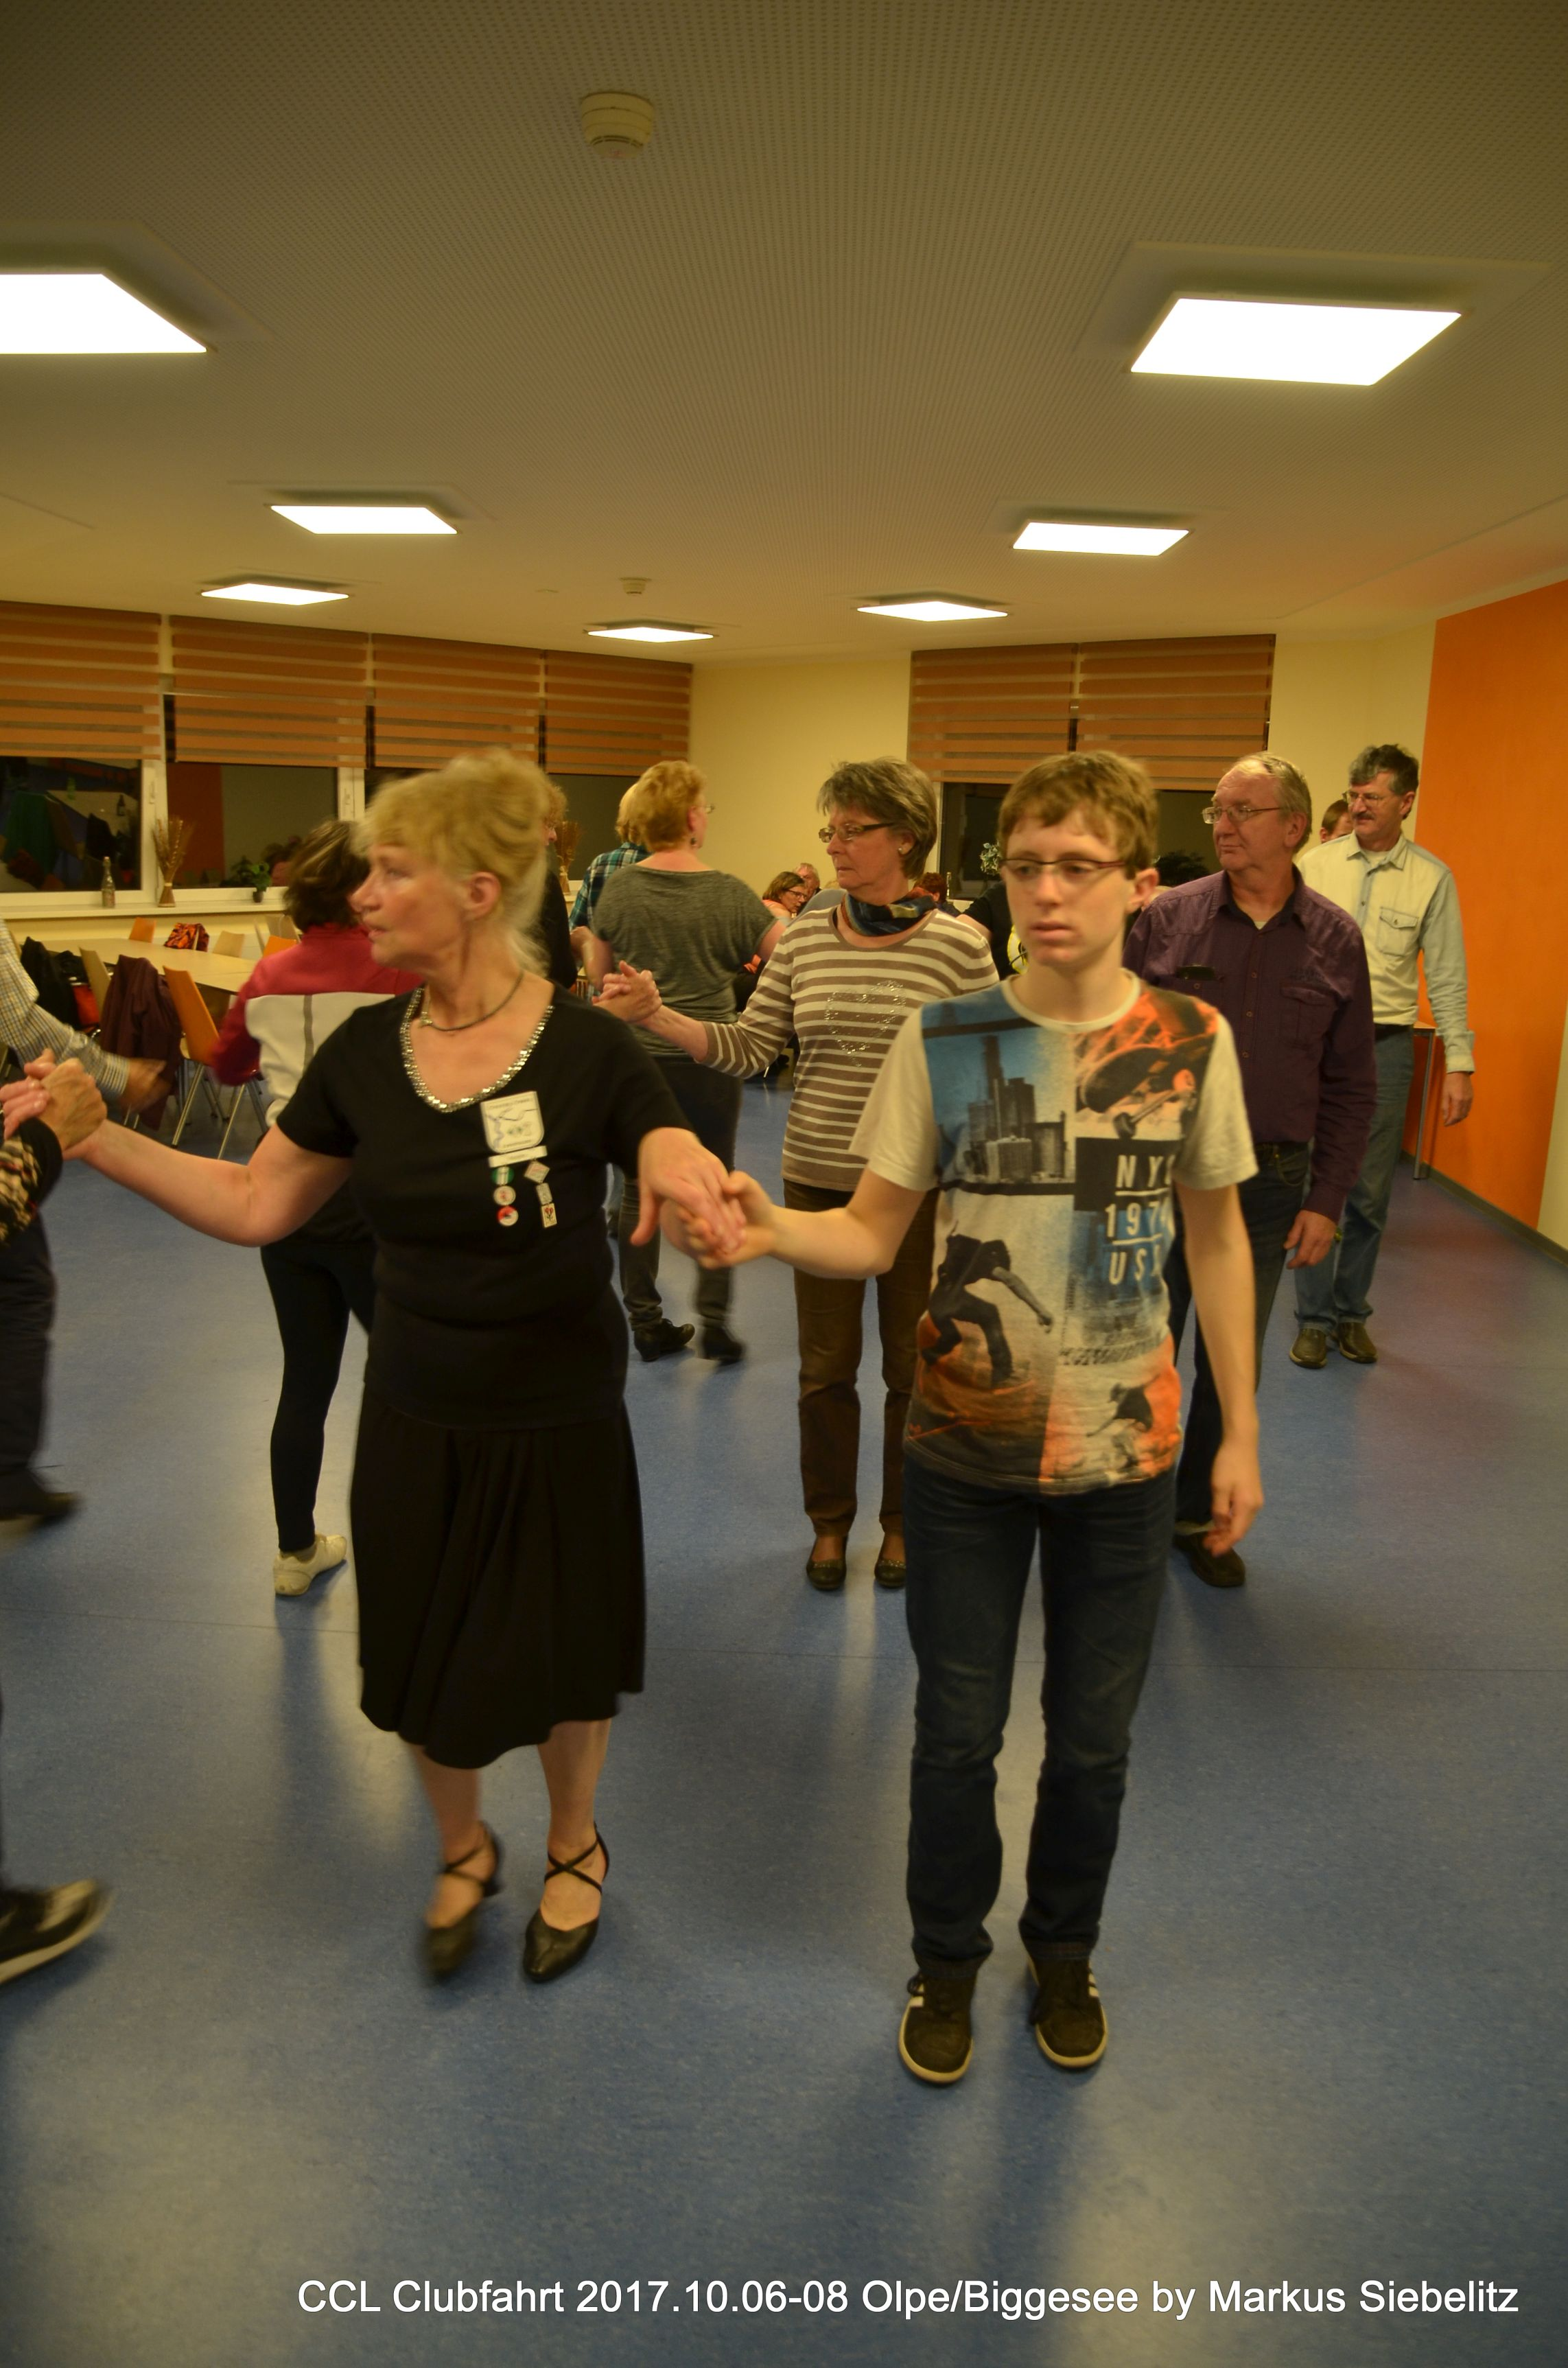 CCL Clubfahrt 2017.10.06-08 Biggesee (9)